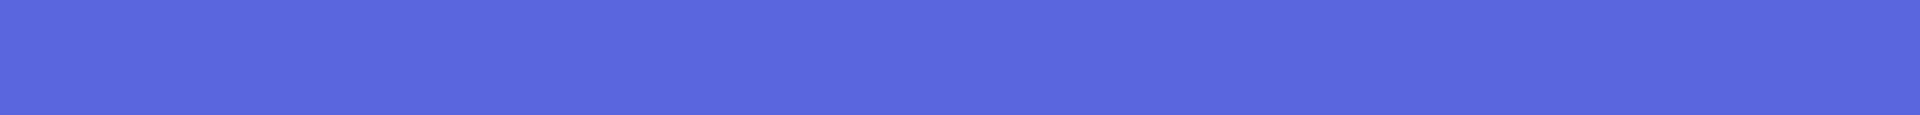 sep-blue-top